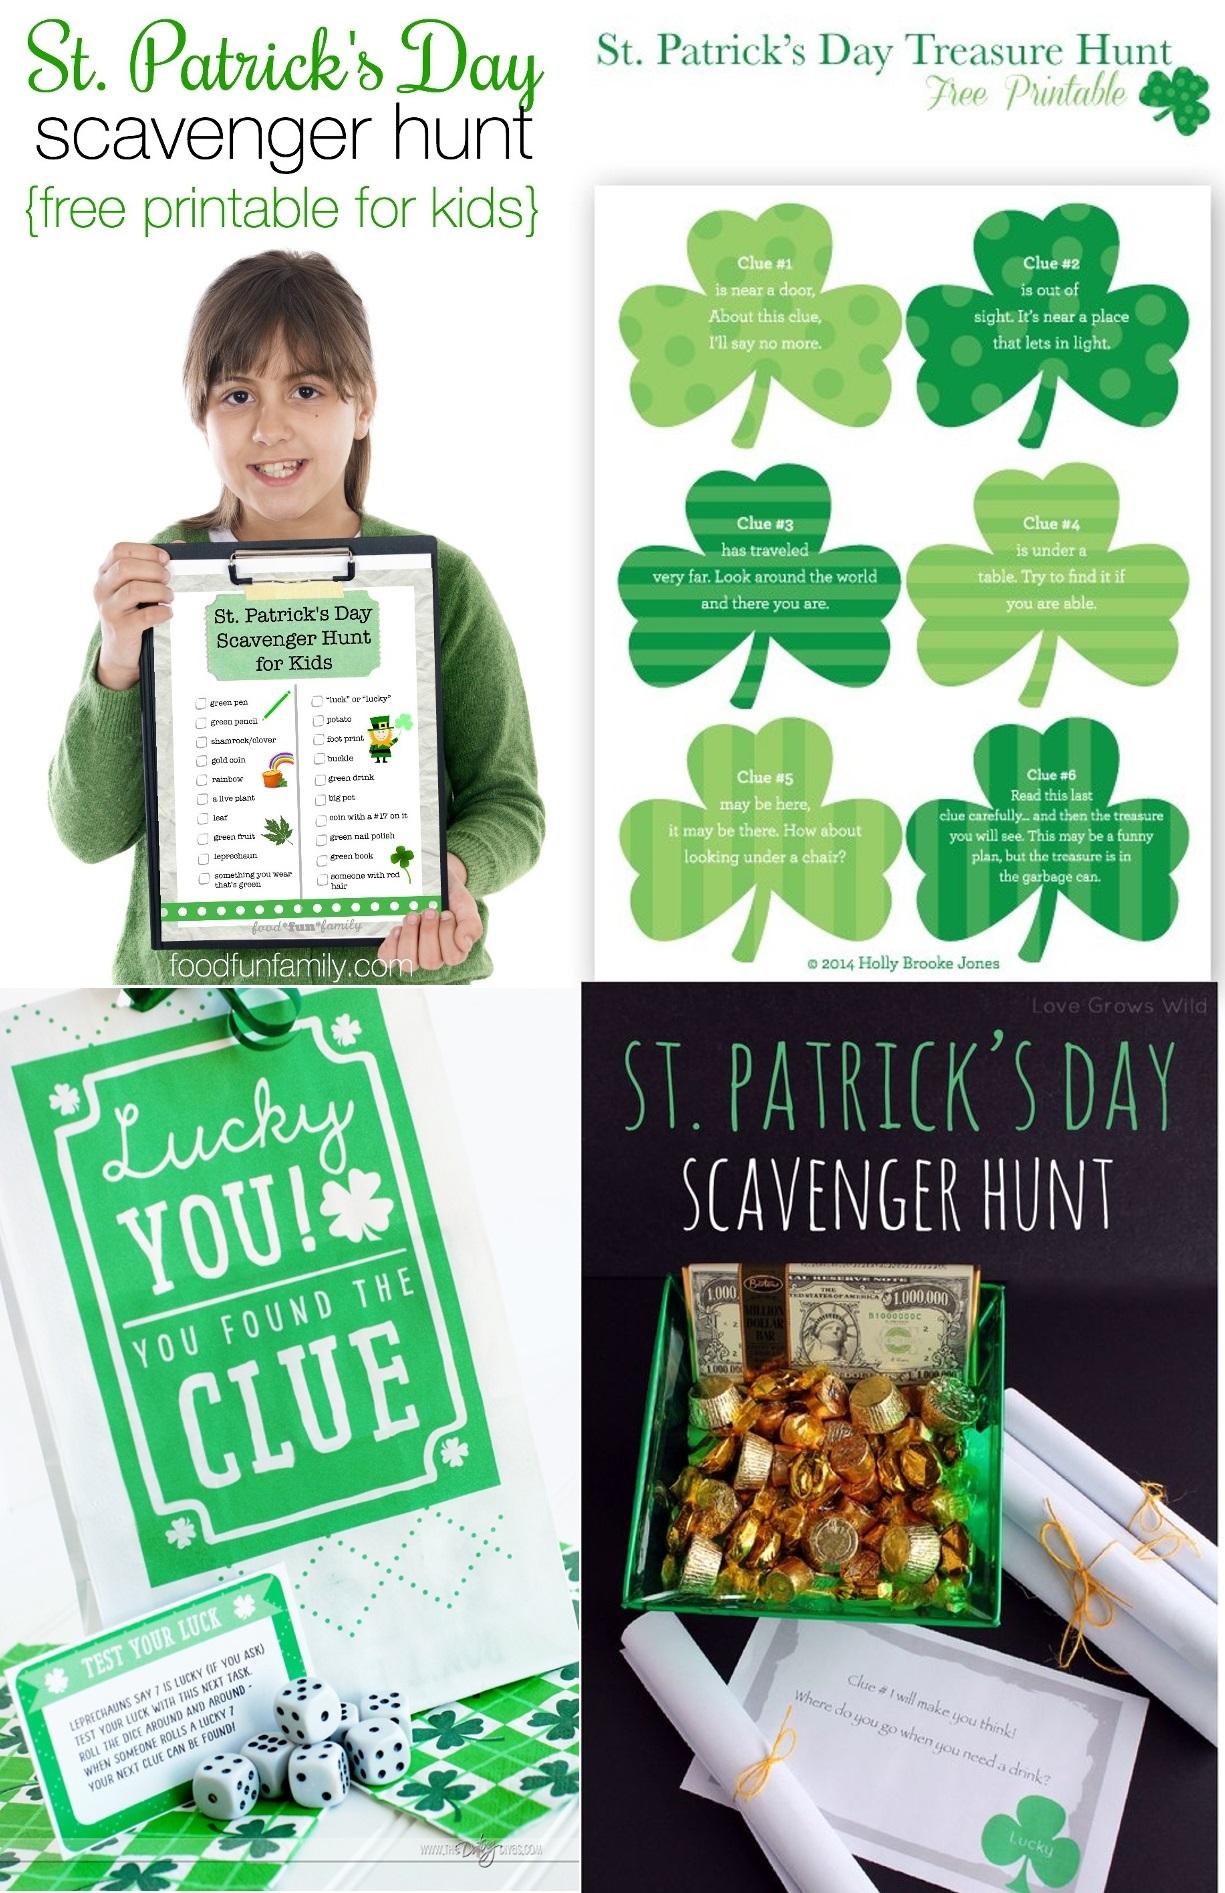 St. Patrick's Day Game Printable Treasure Hunt Scavenger Hunt